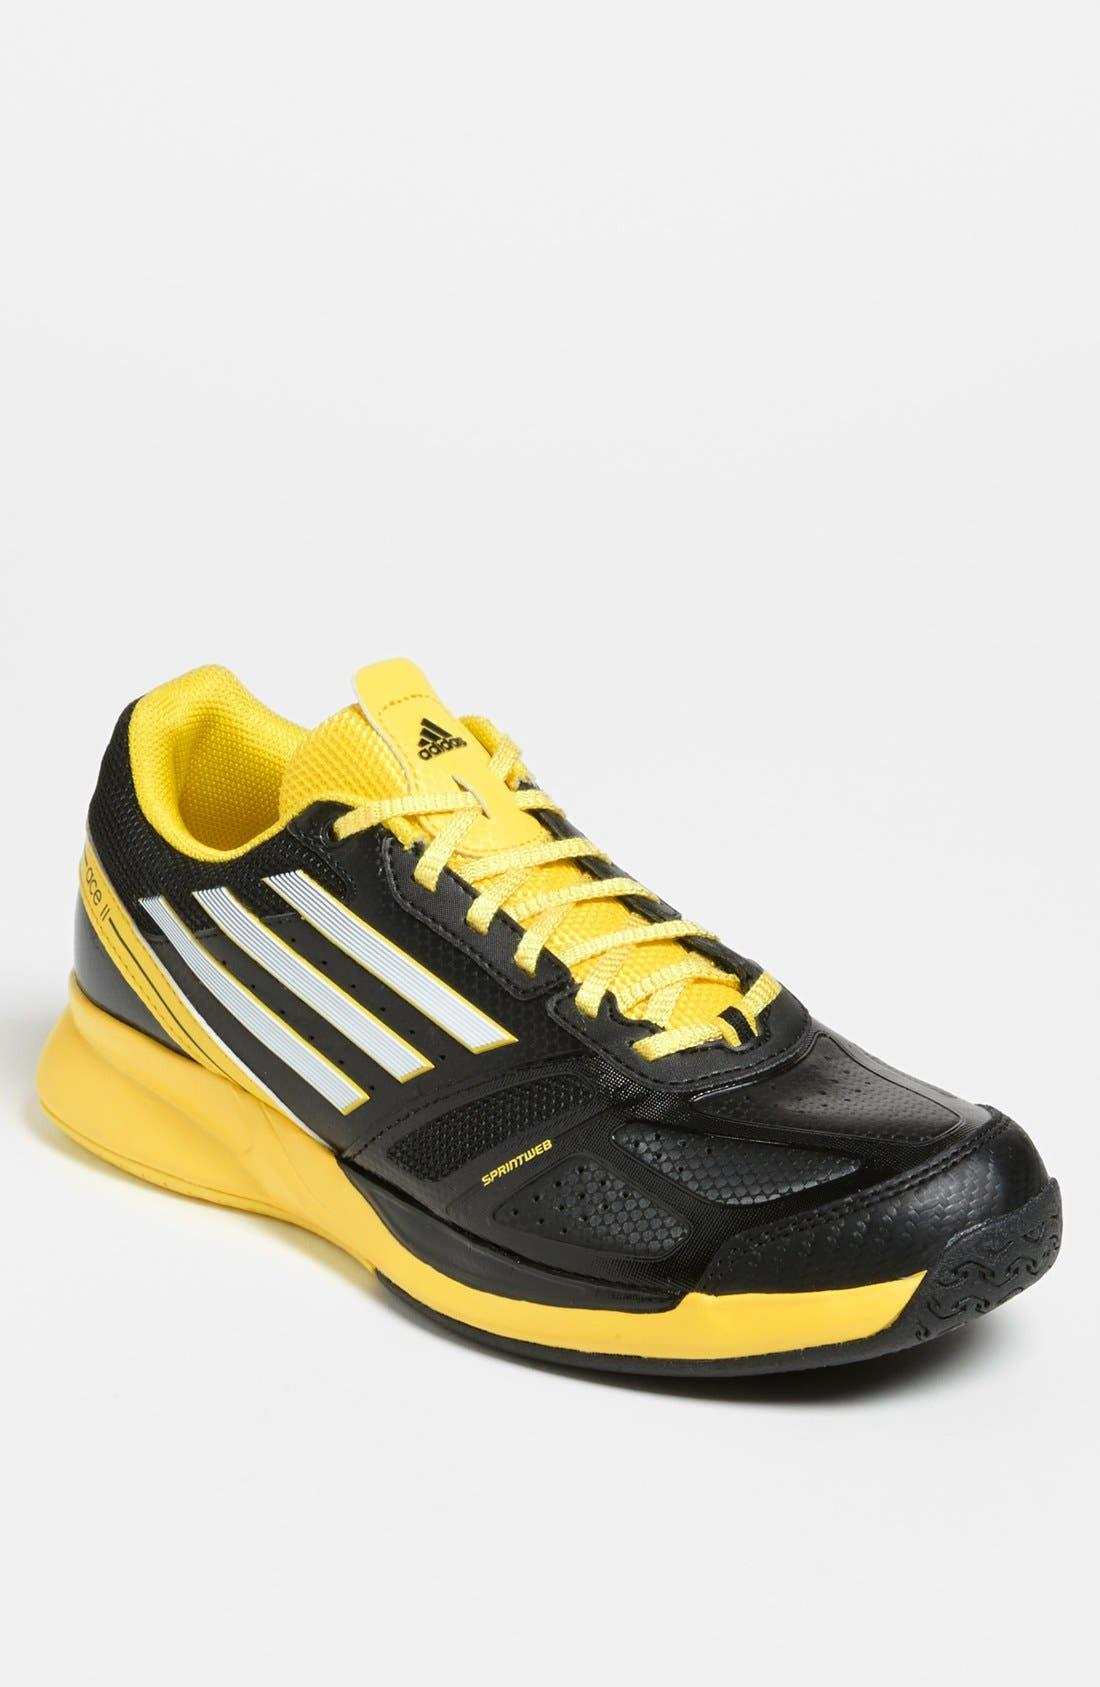 Alternate Image 1 Selected - adidas 'adiZero Ace II' Tennis Shoe (Men)